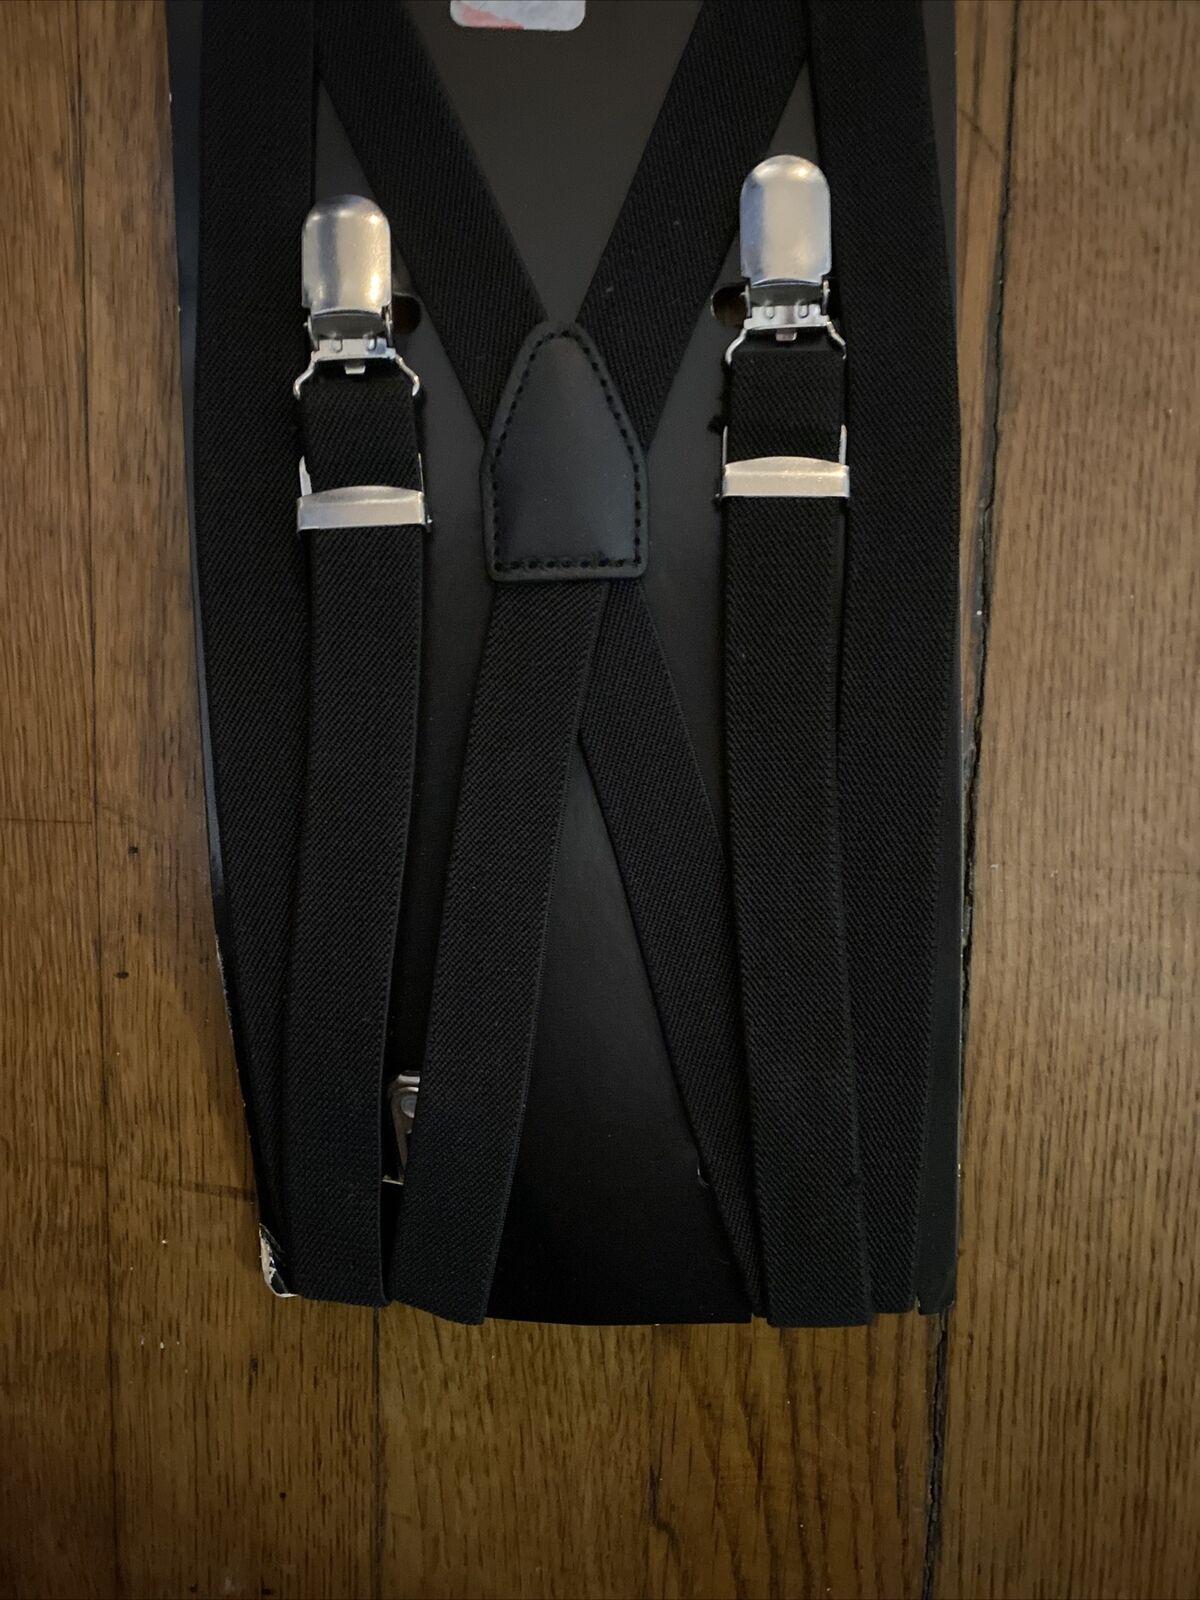 New Adjustable Suspender By H&M Black